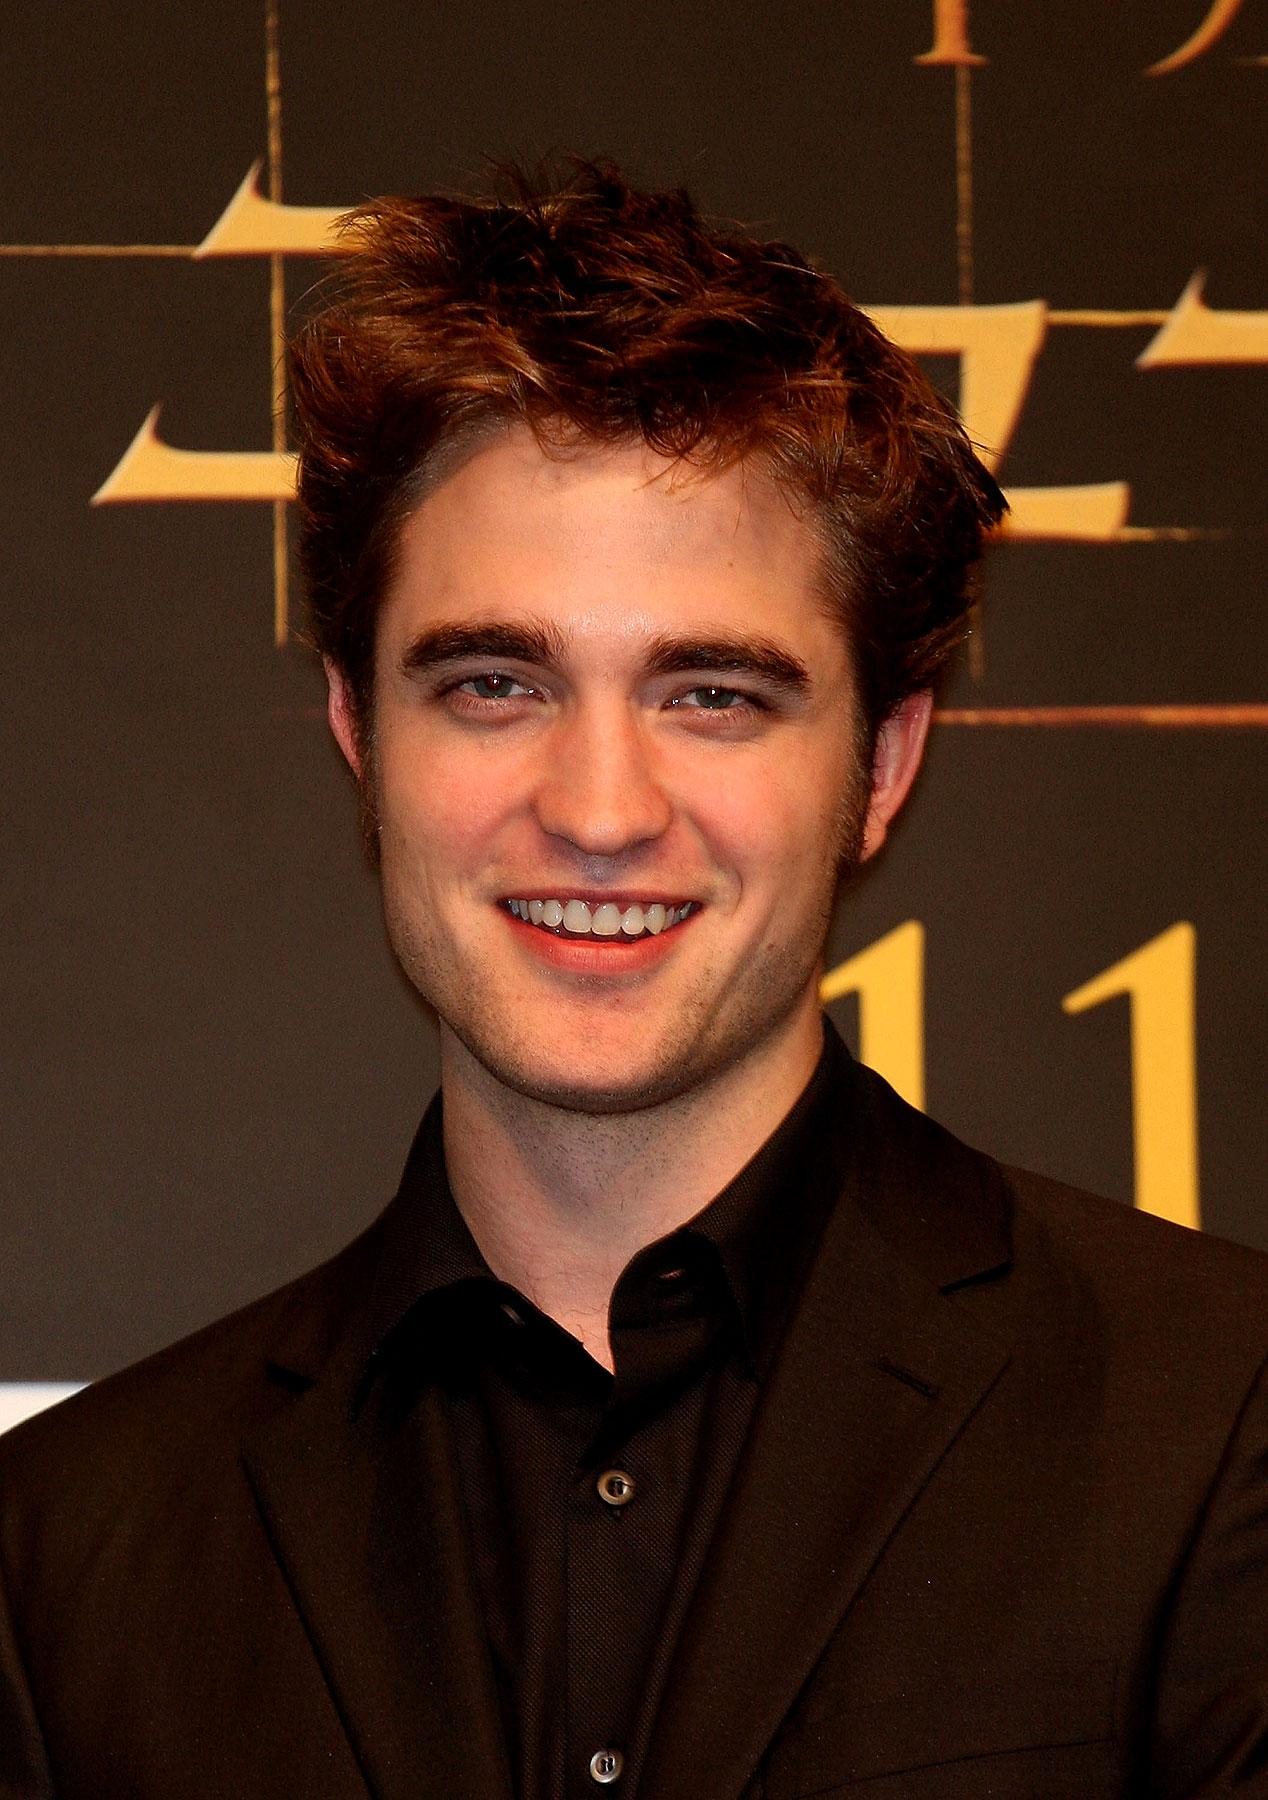 PHOTO GALLERY: Robert Pattinson's Tokyo Press Conference